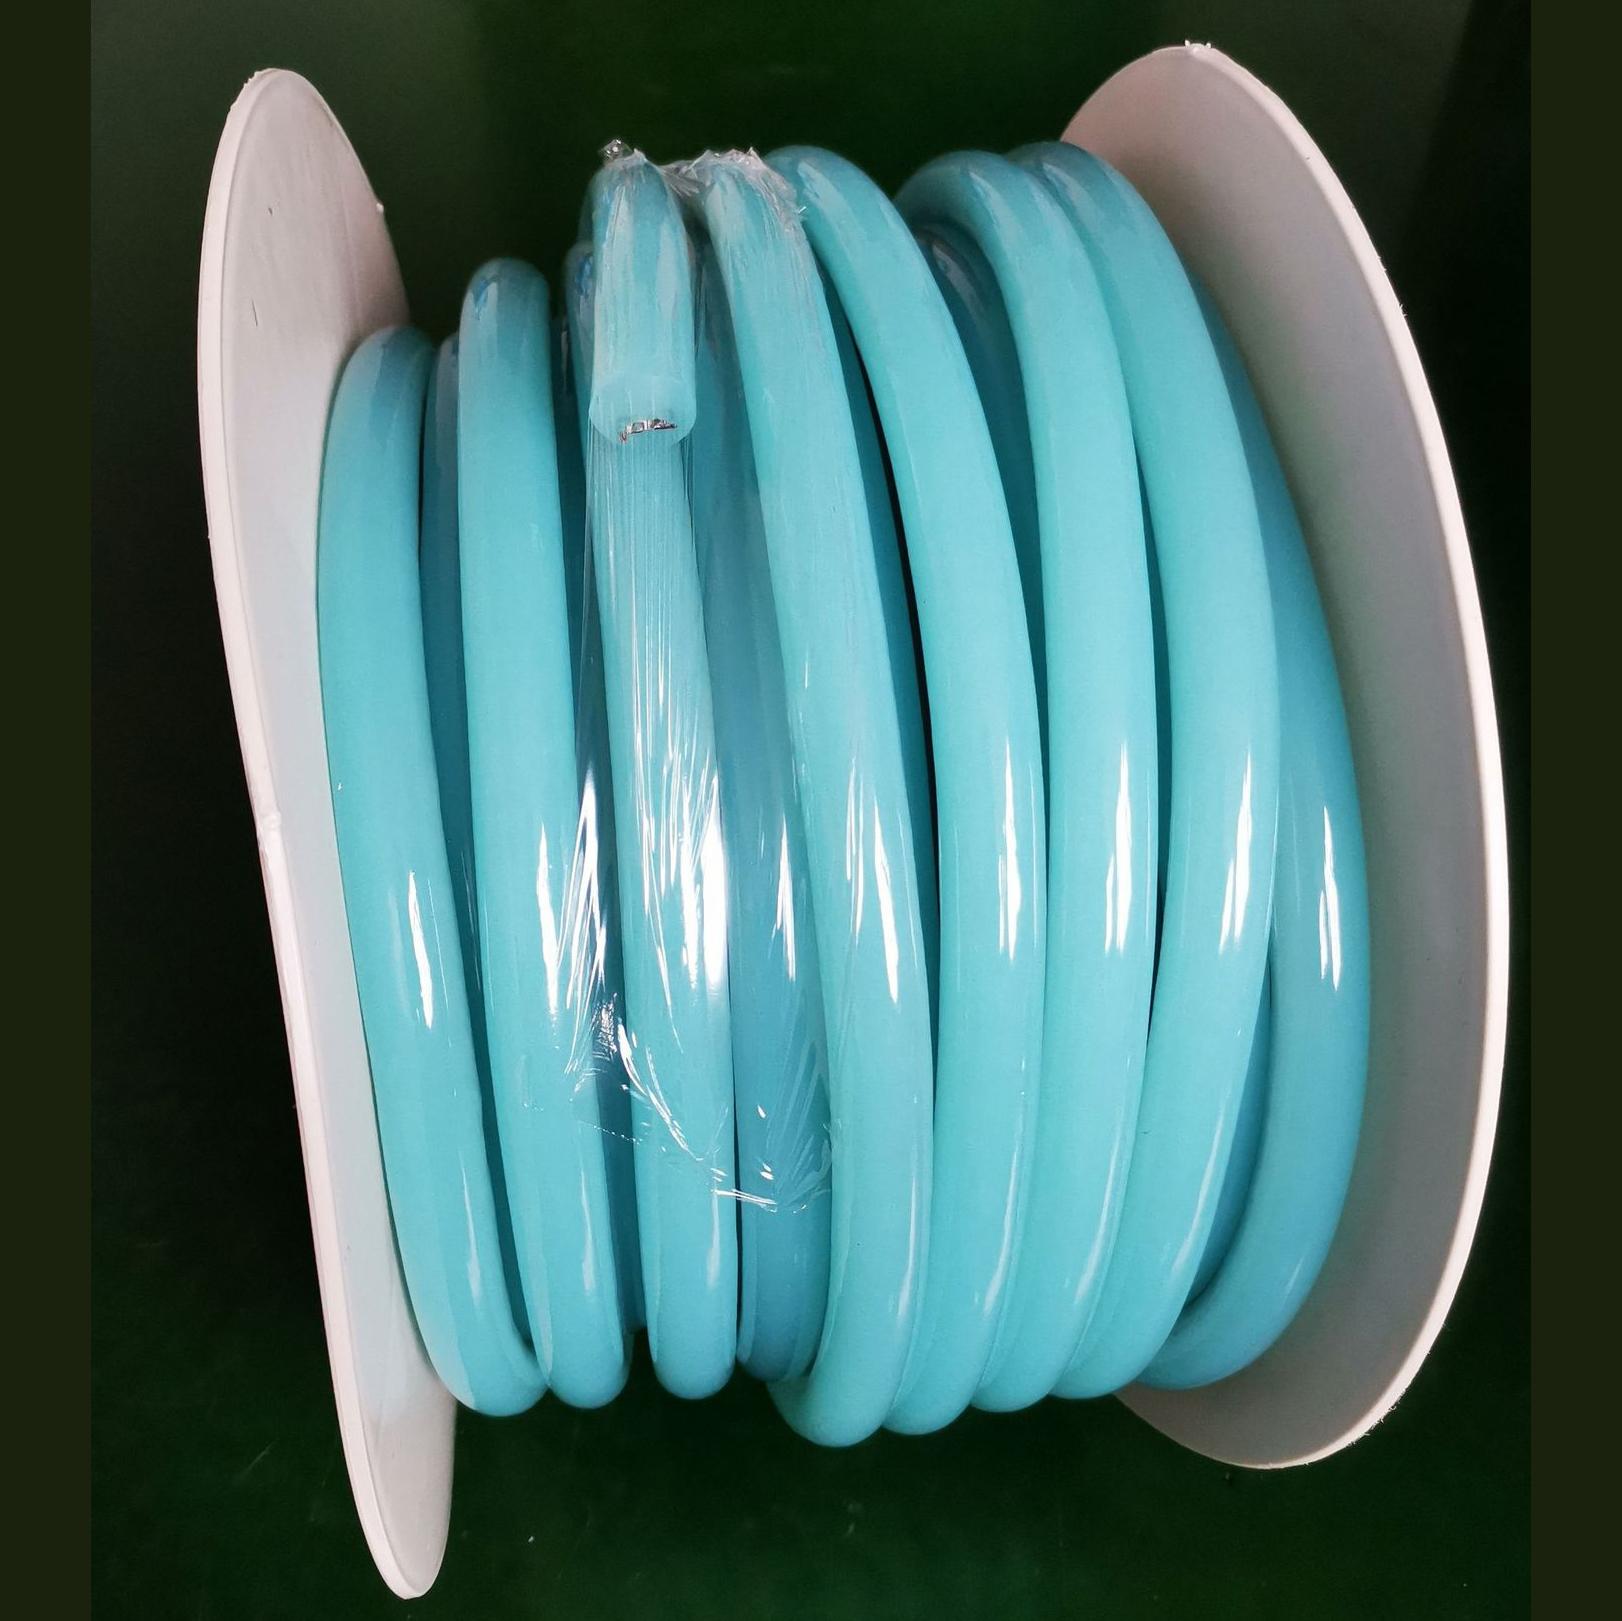 16mm Ice Blue 360 Degree Round LED Neon Strip Flexible Light 120Leds/M